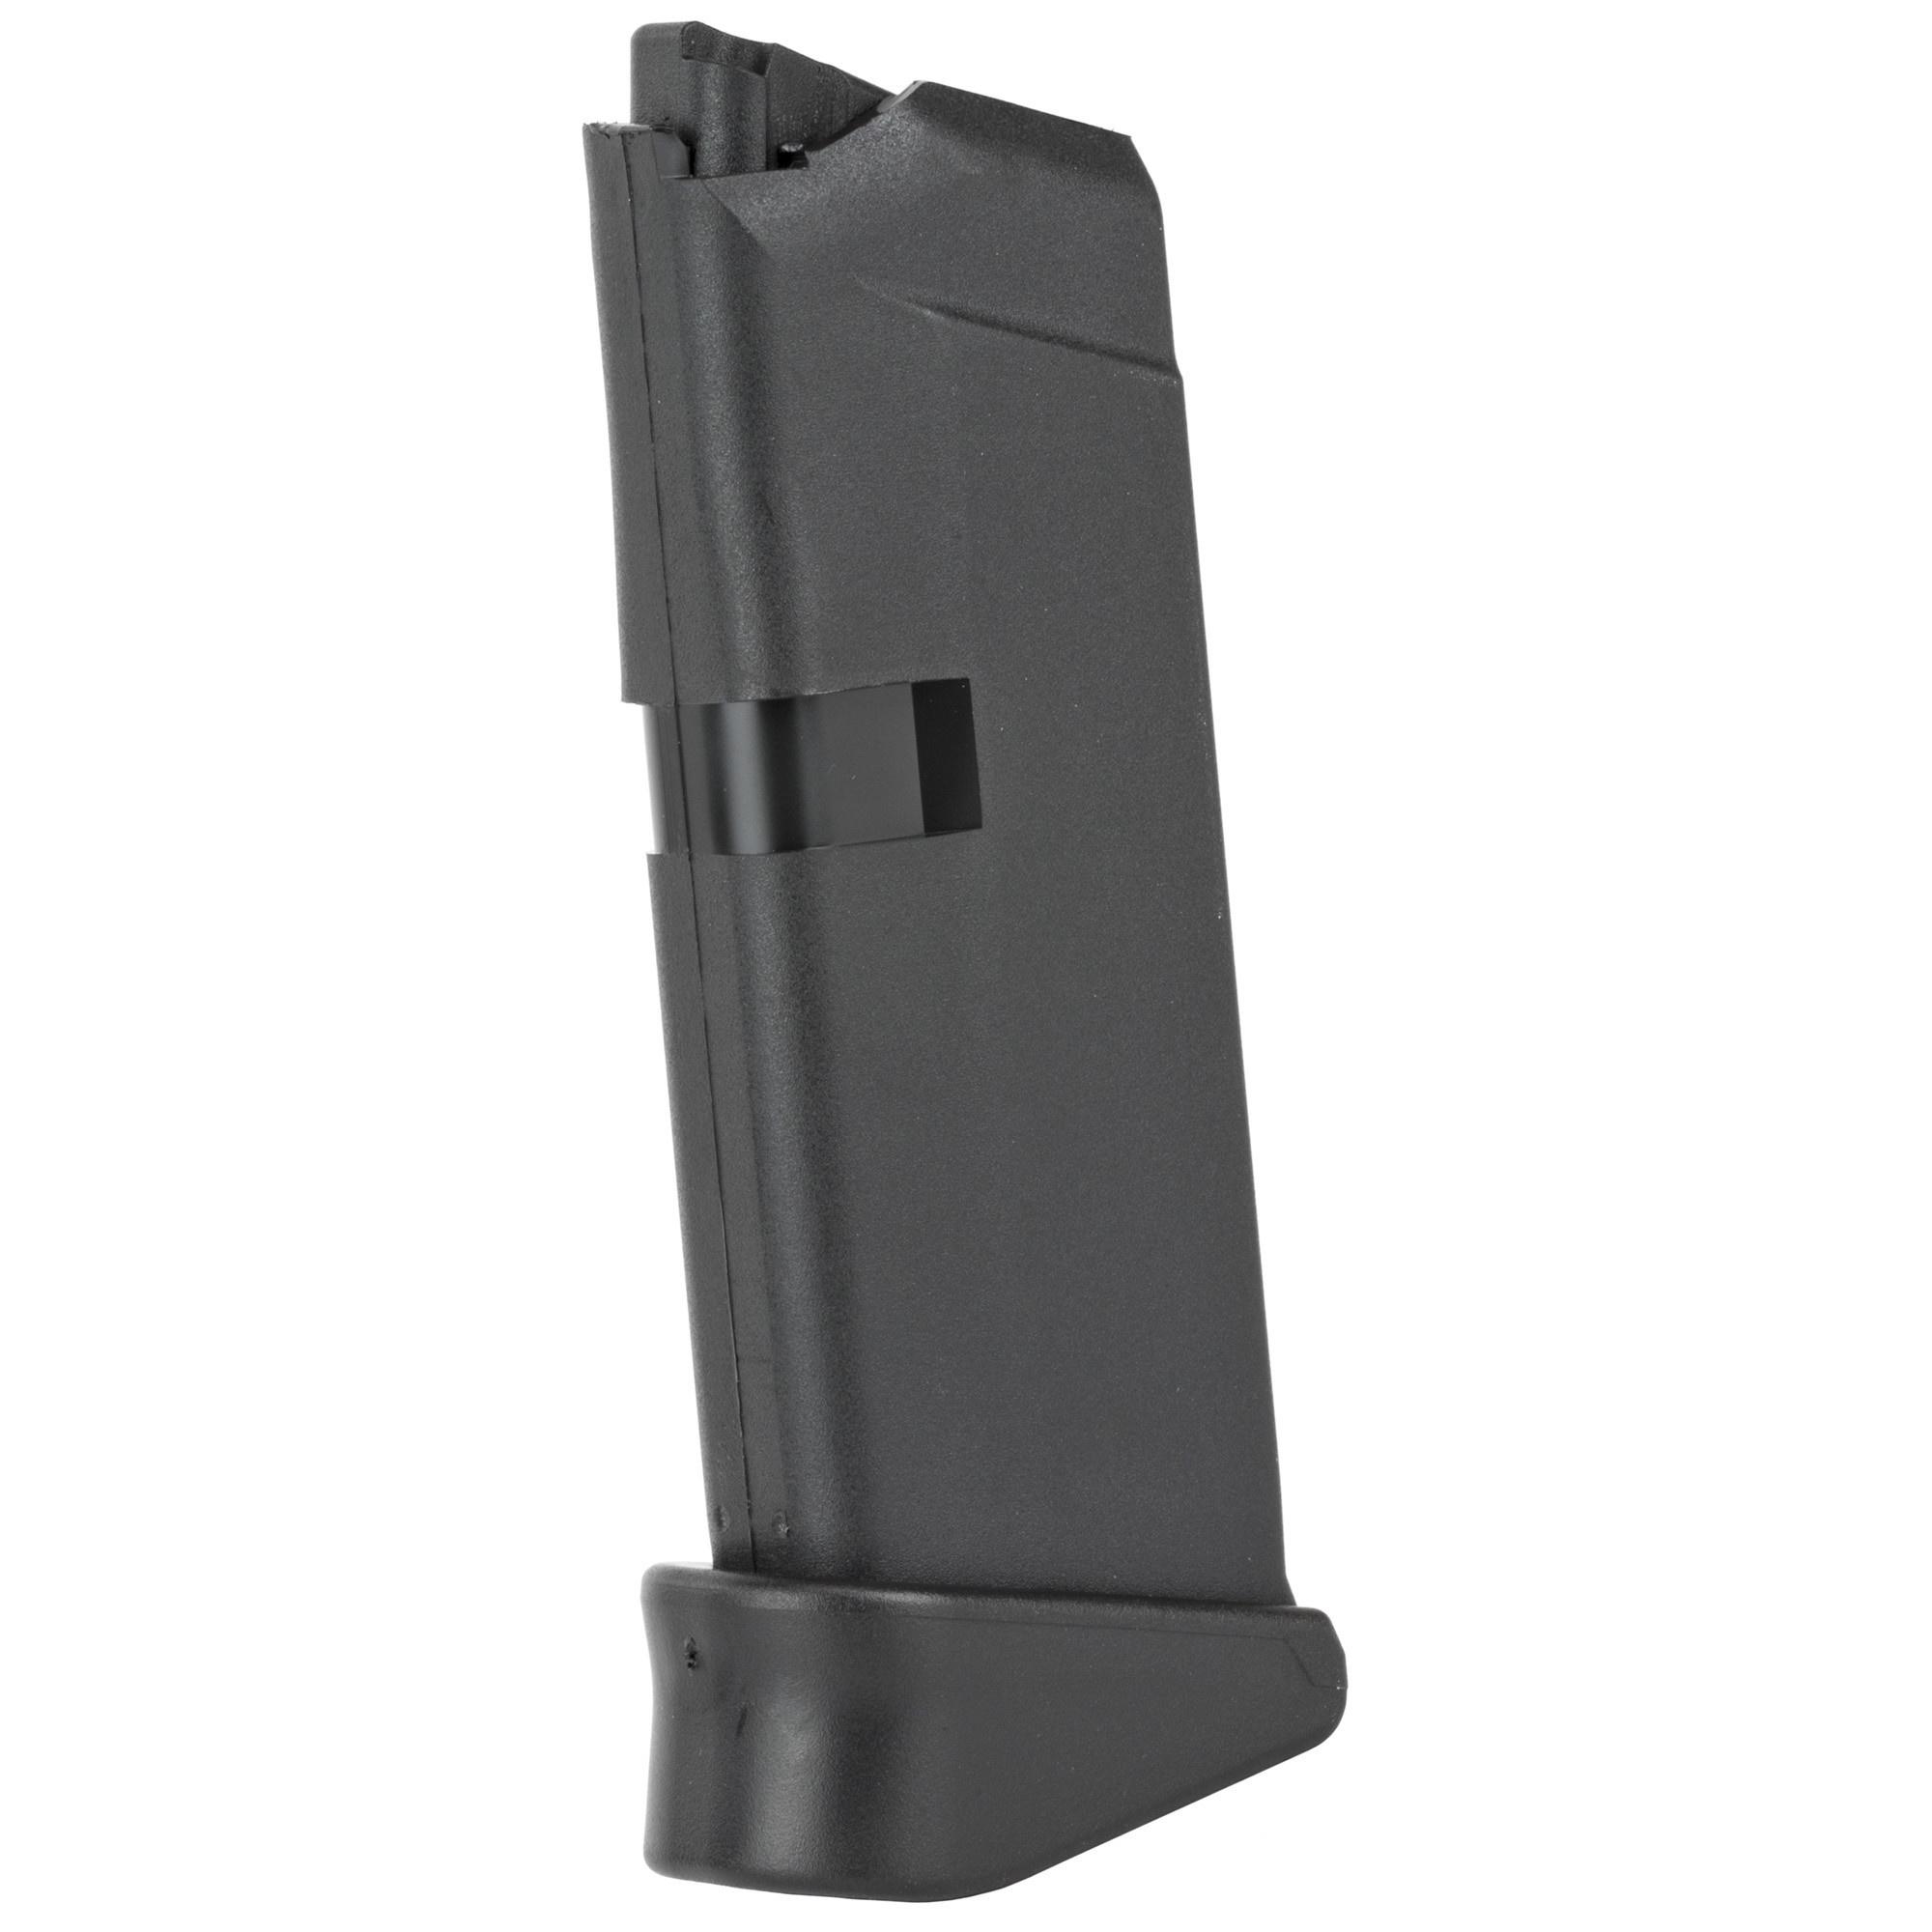 Glock GLOCK 42 6/RD W/EXTENSION Magazine